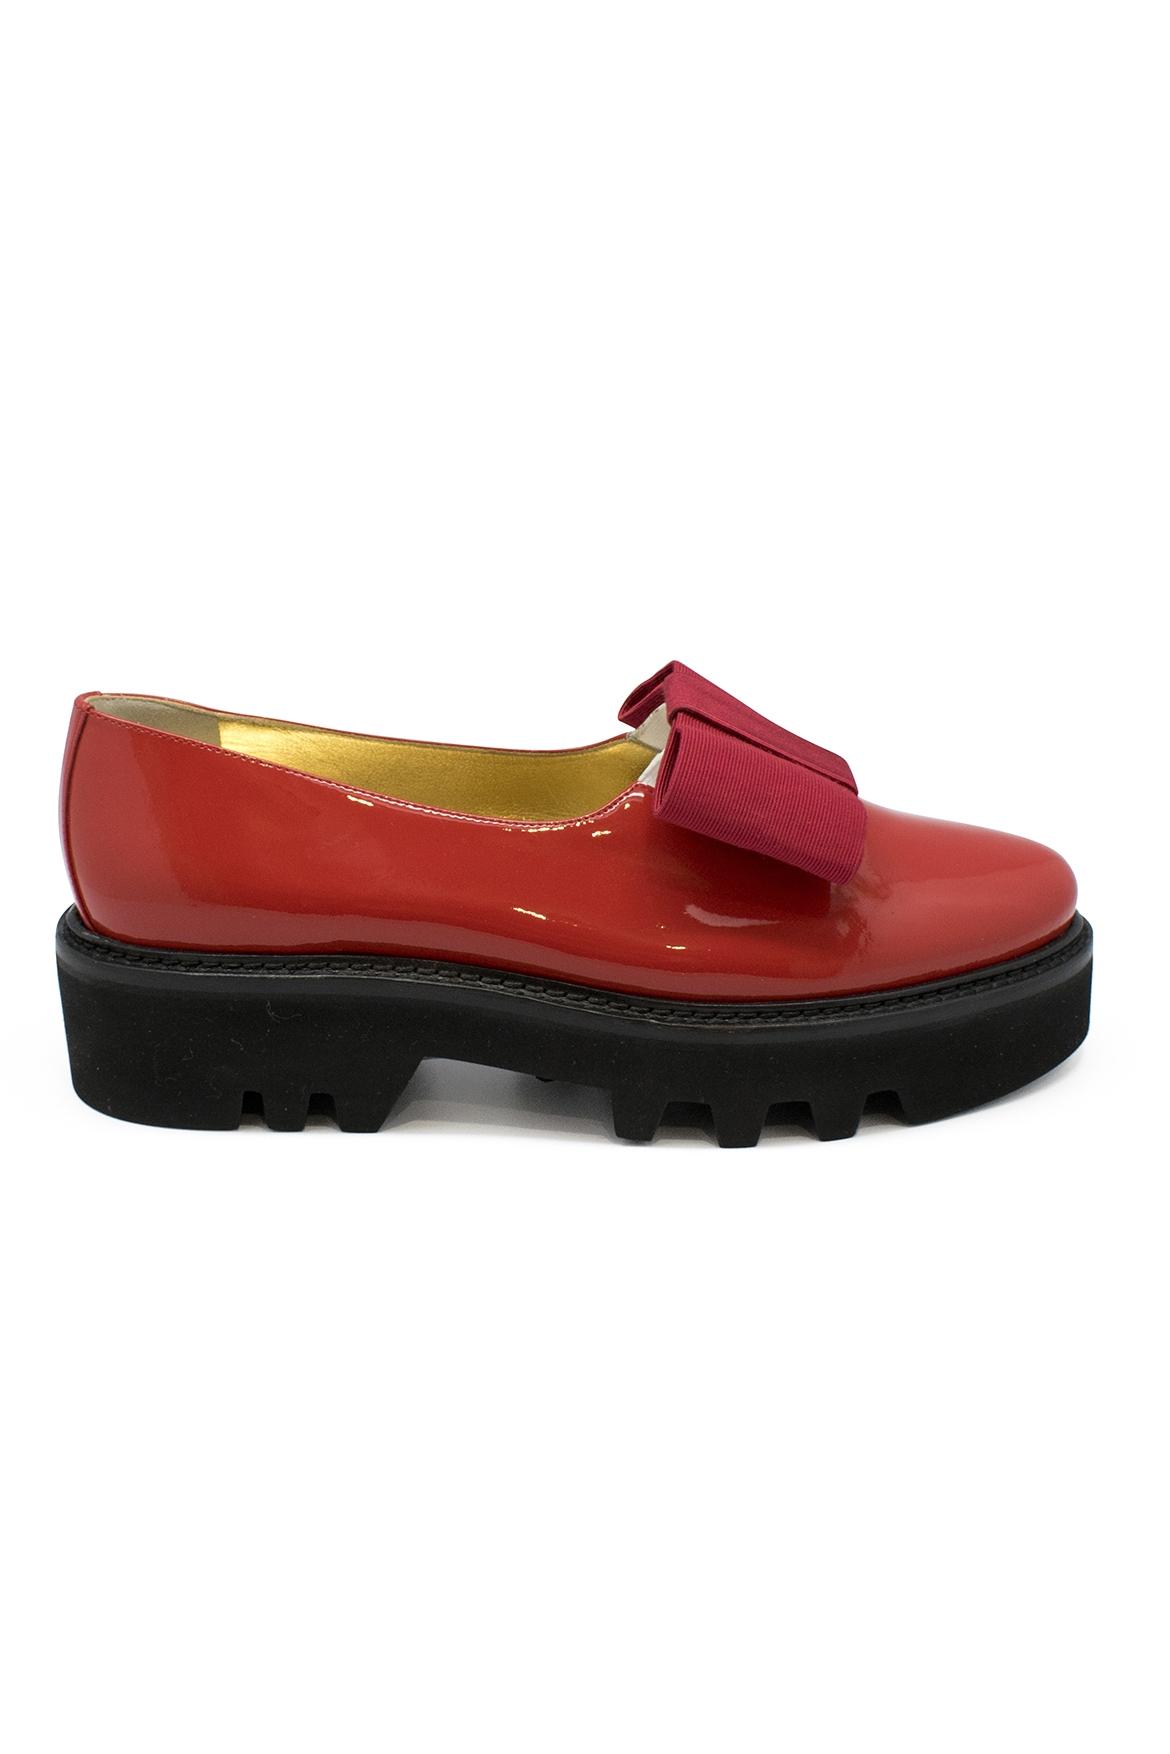 Chaussures Smoking - Walter Steiger - Modalova